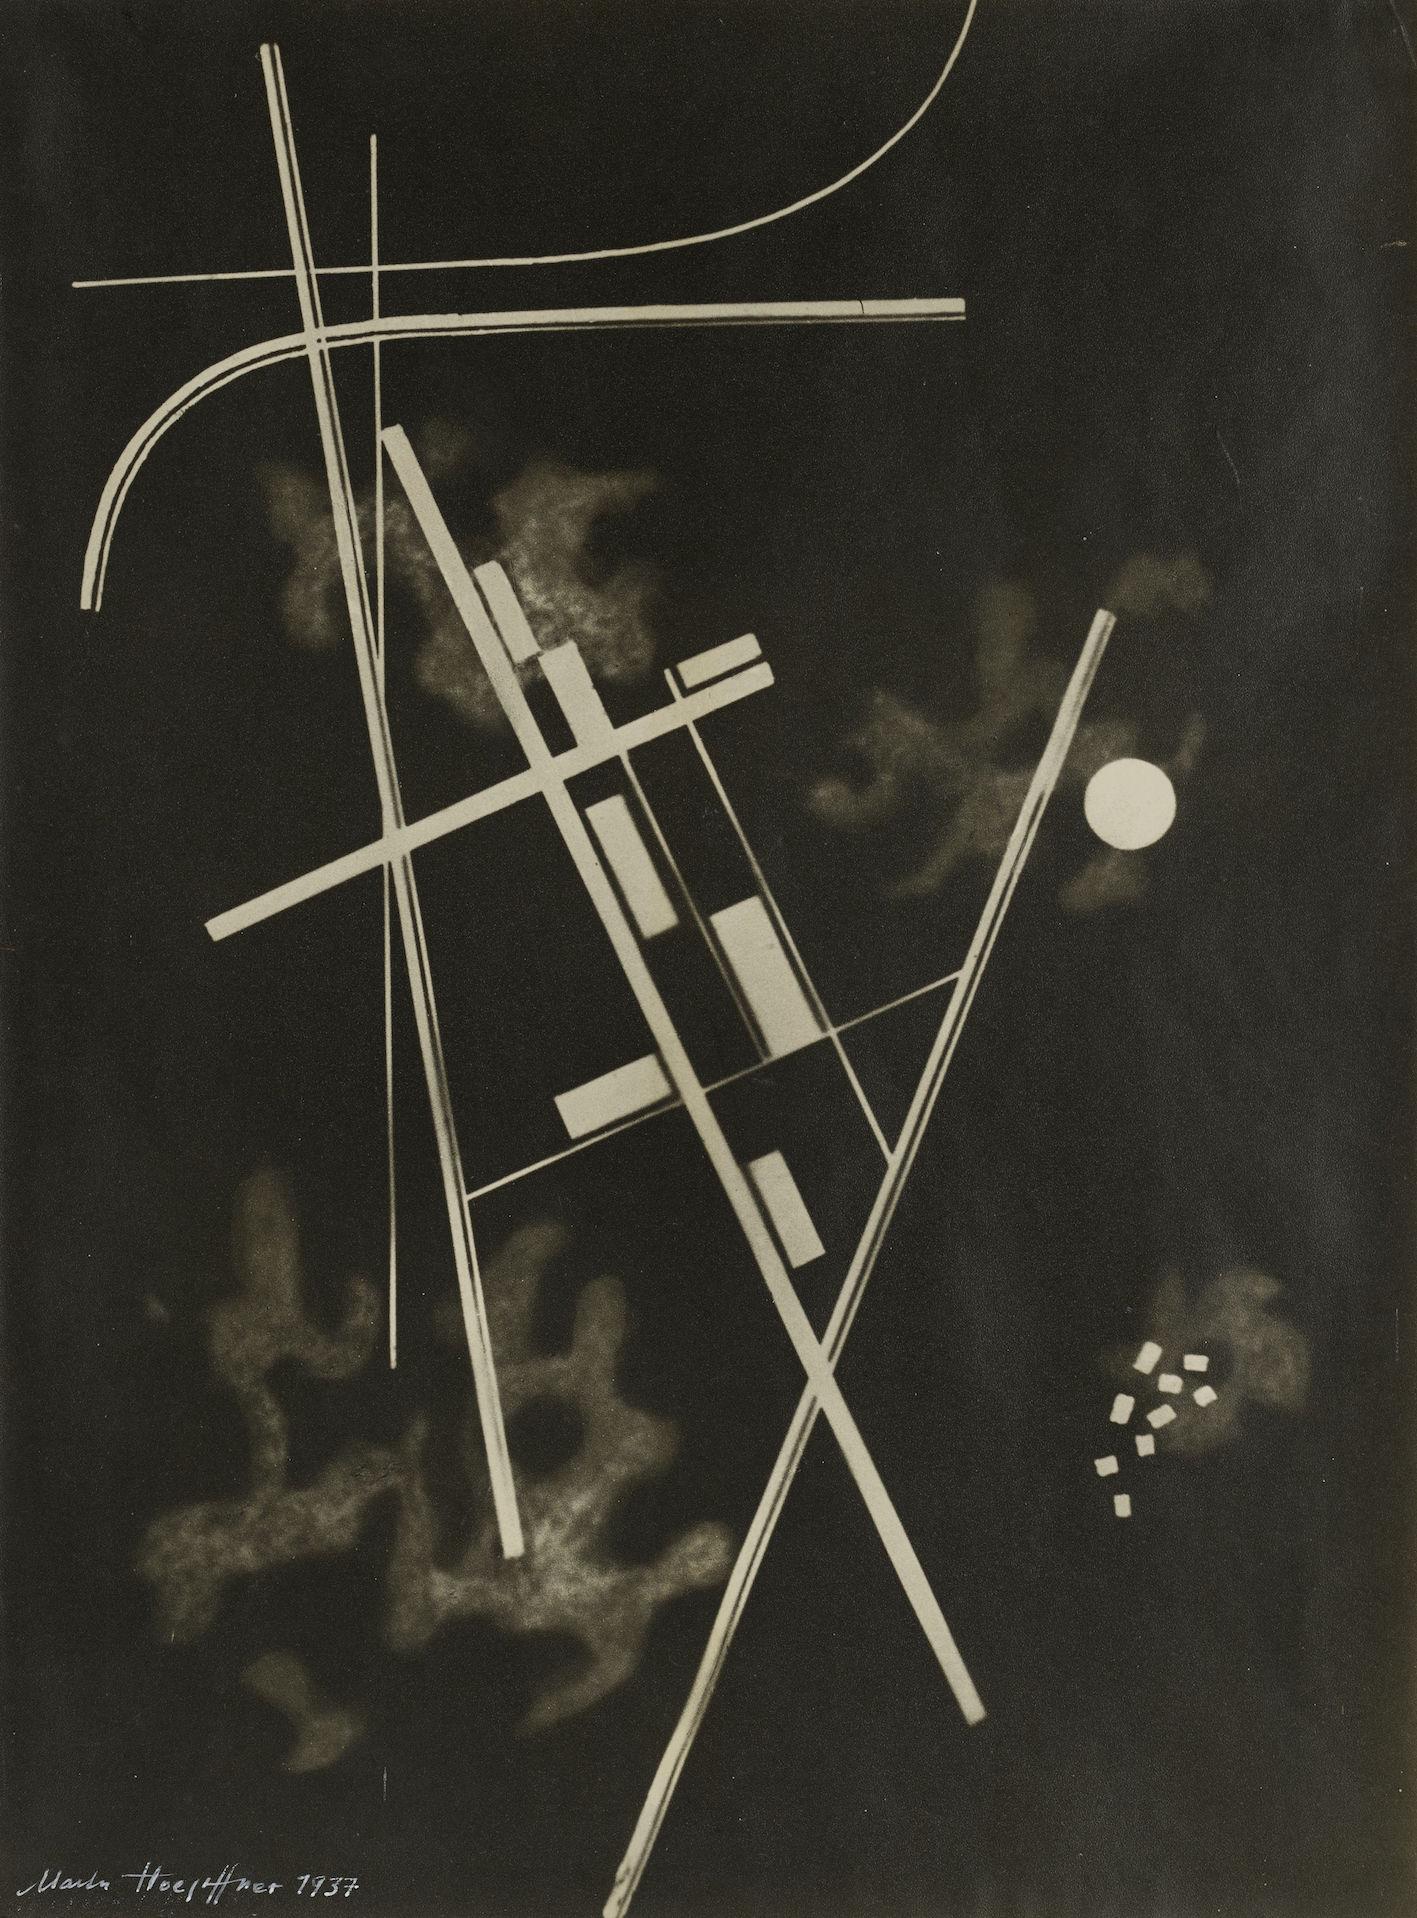 Marta Hoepffner, Homage to Kandinsky, 1937.jpg